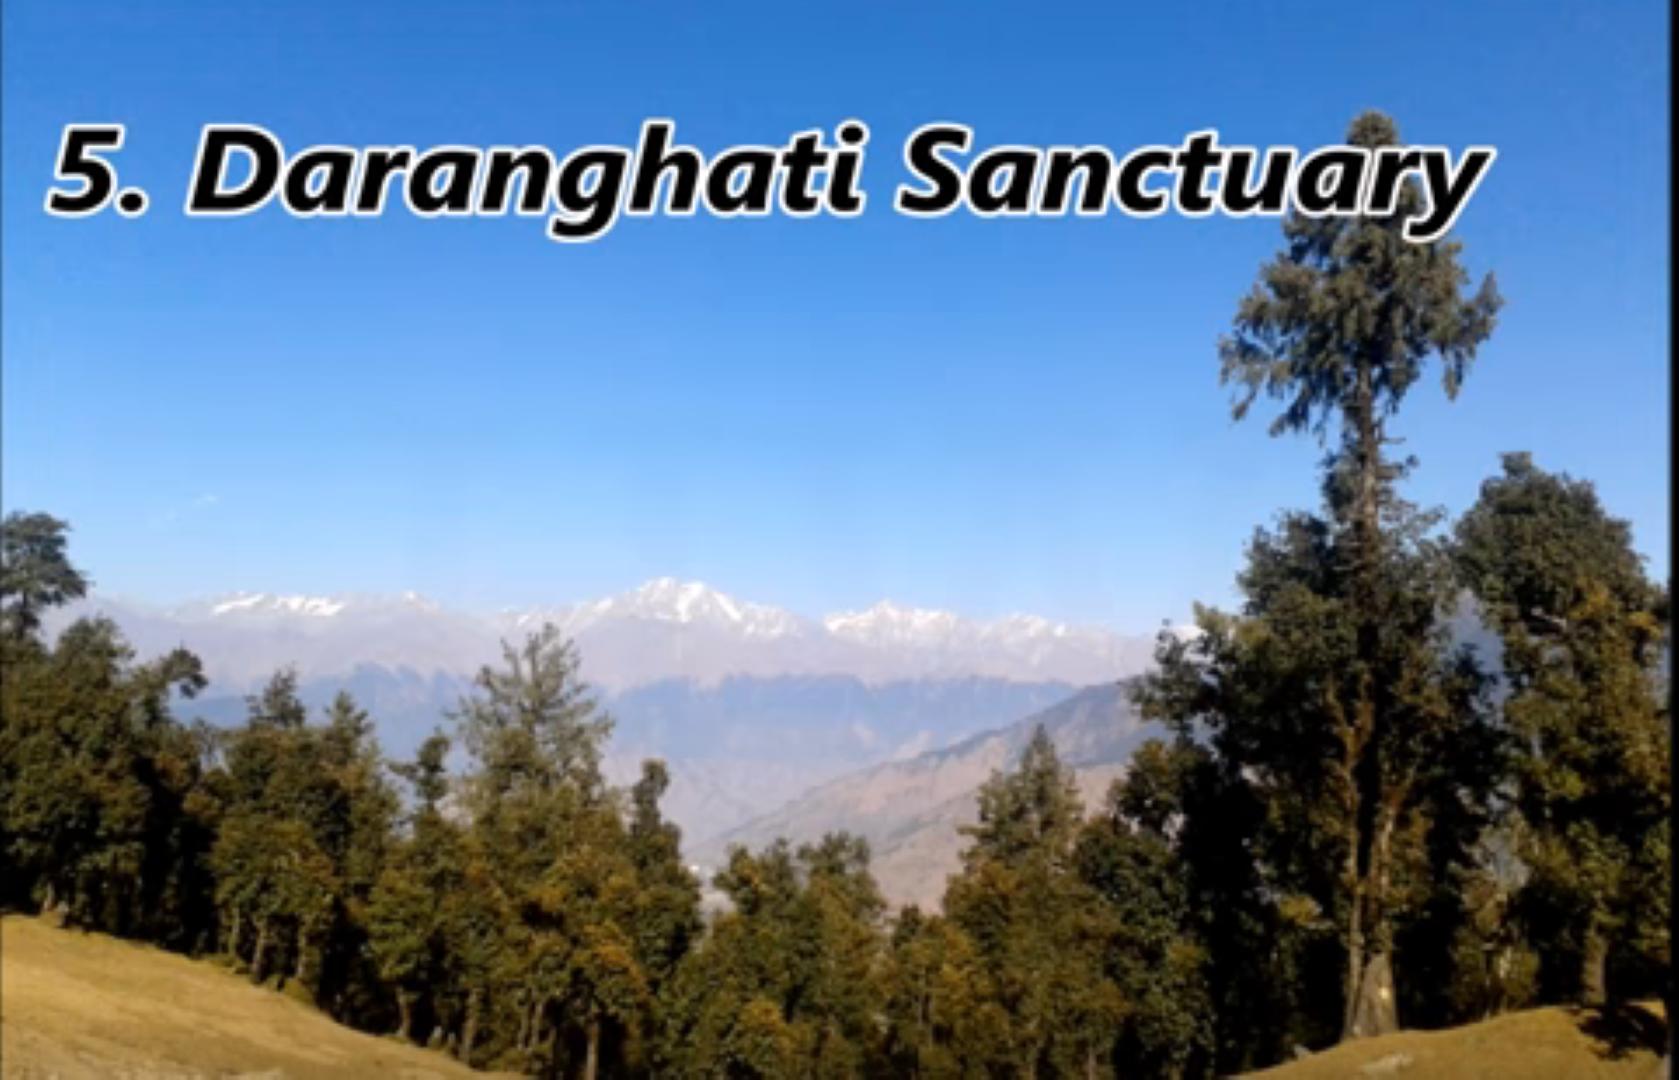 Daranghati sanctuary by tempo traveller